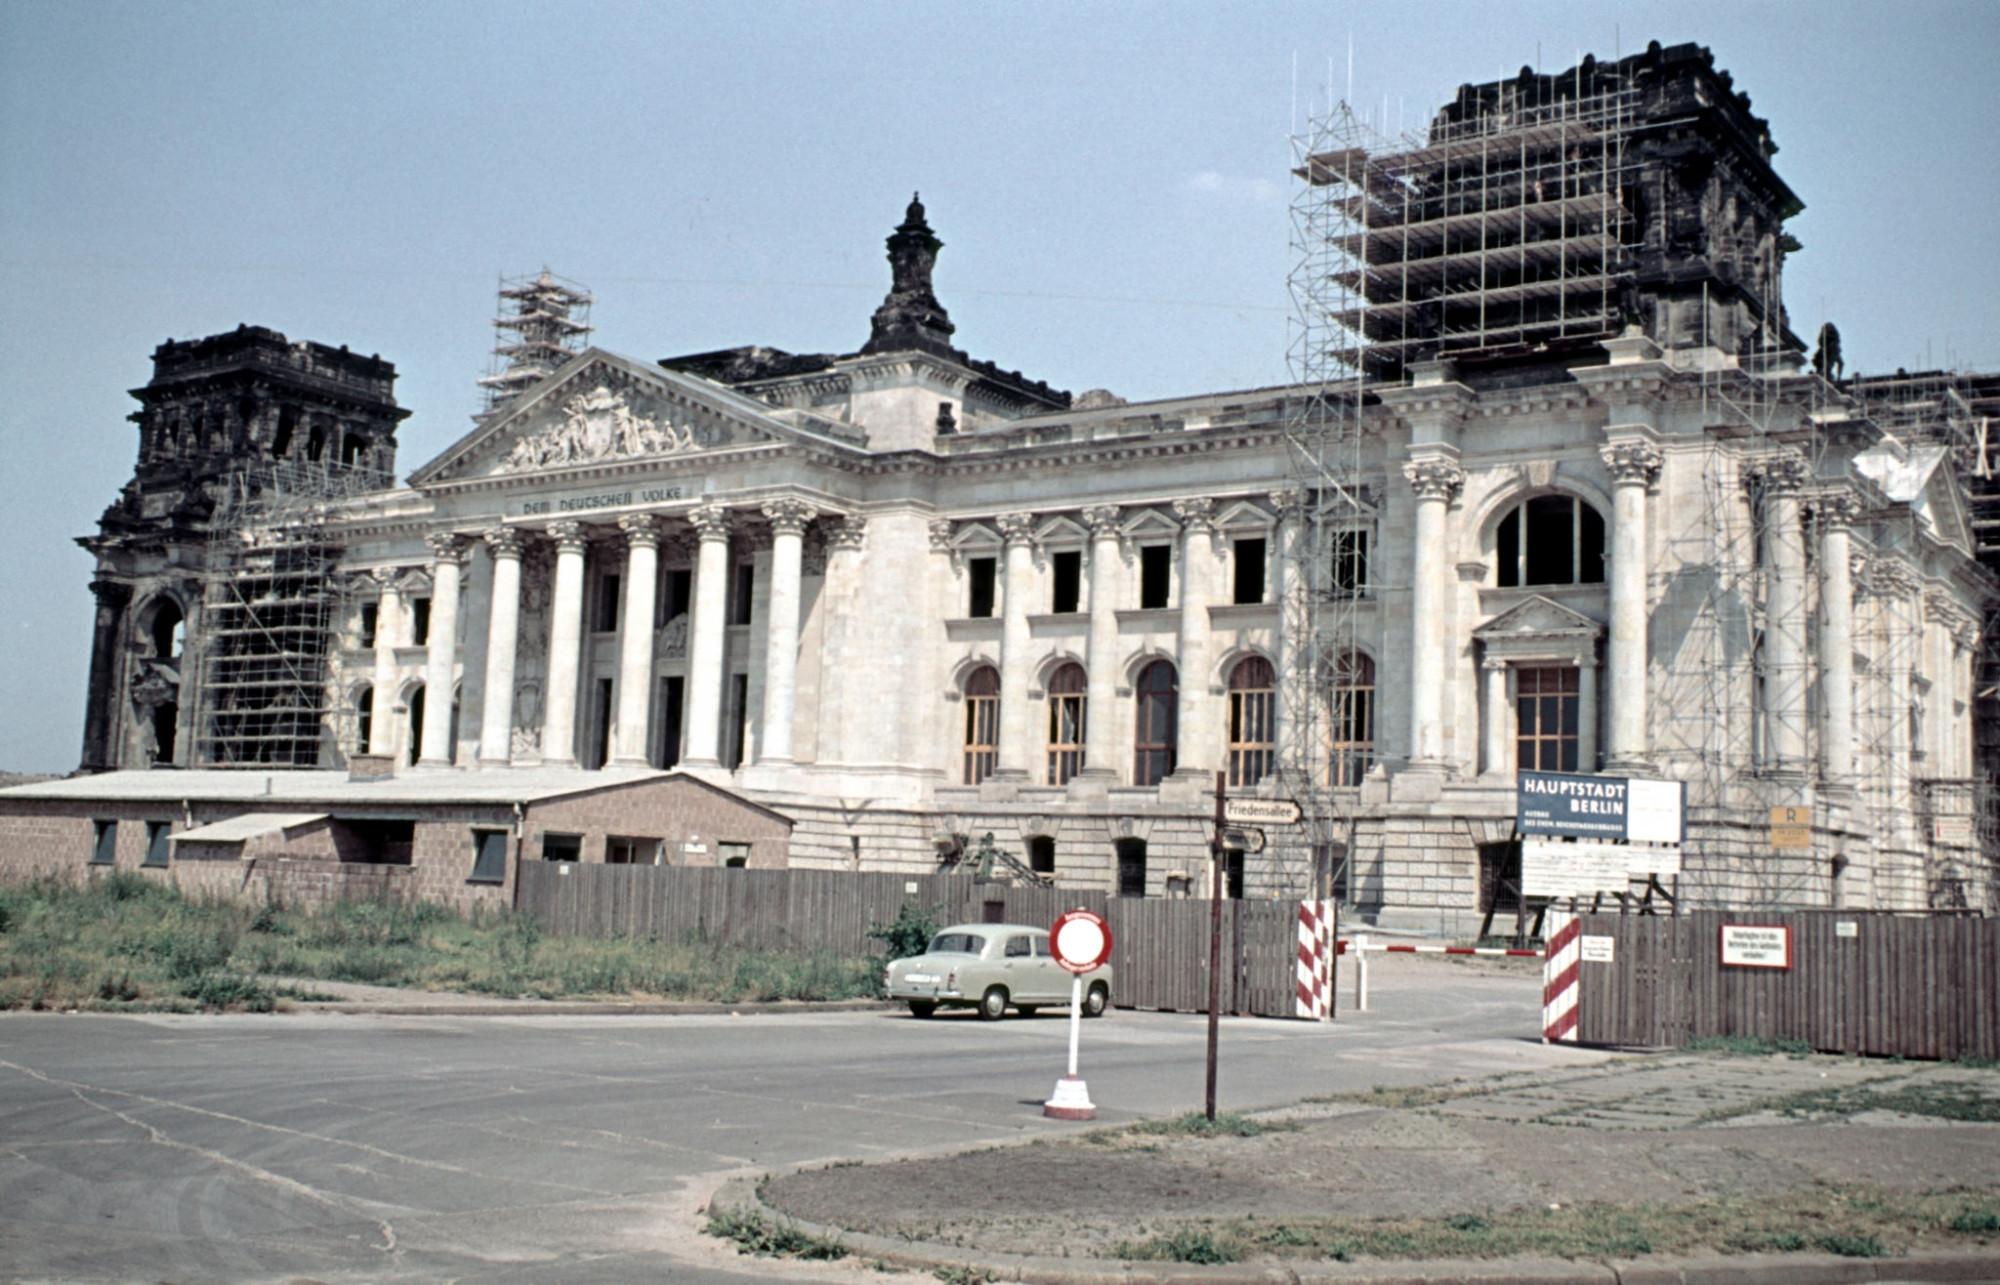 1959 Berlin by Sobotta